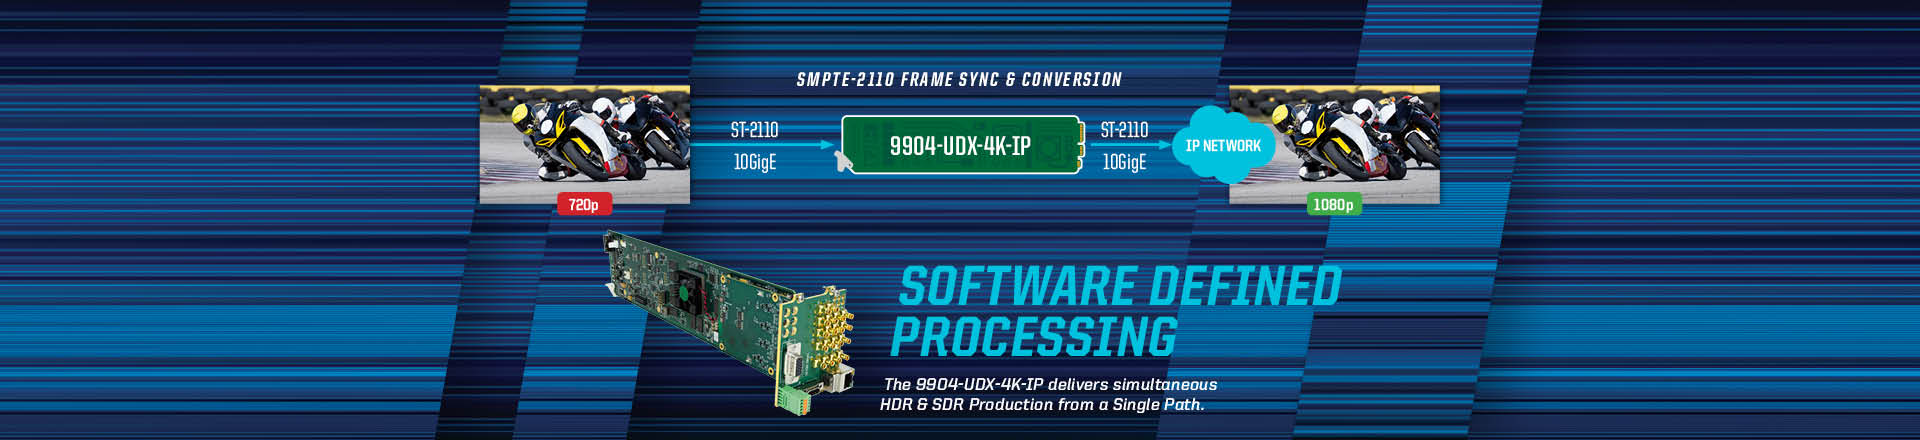 9904-UDX4K-IP Software Defined Processing